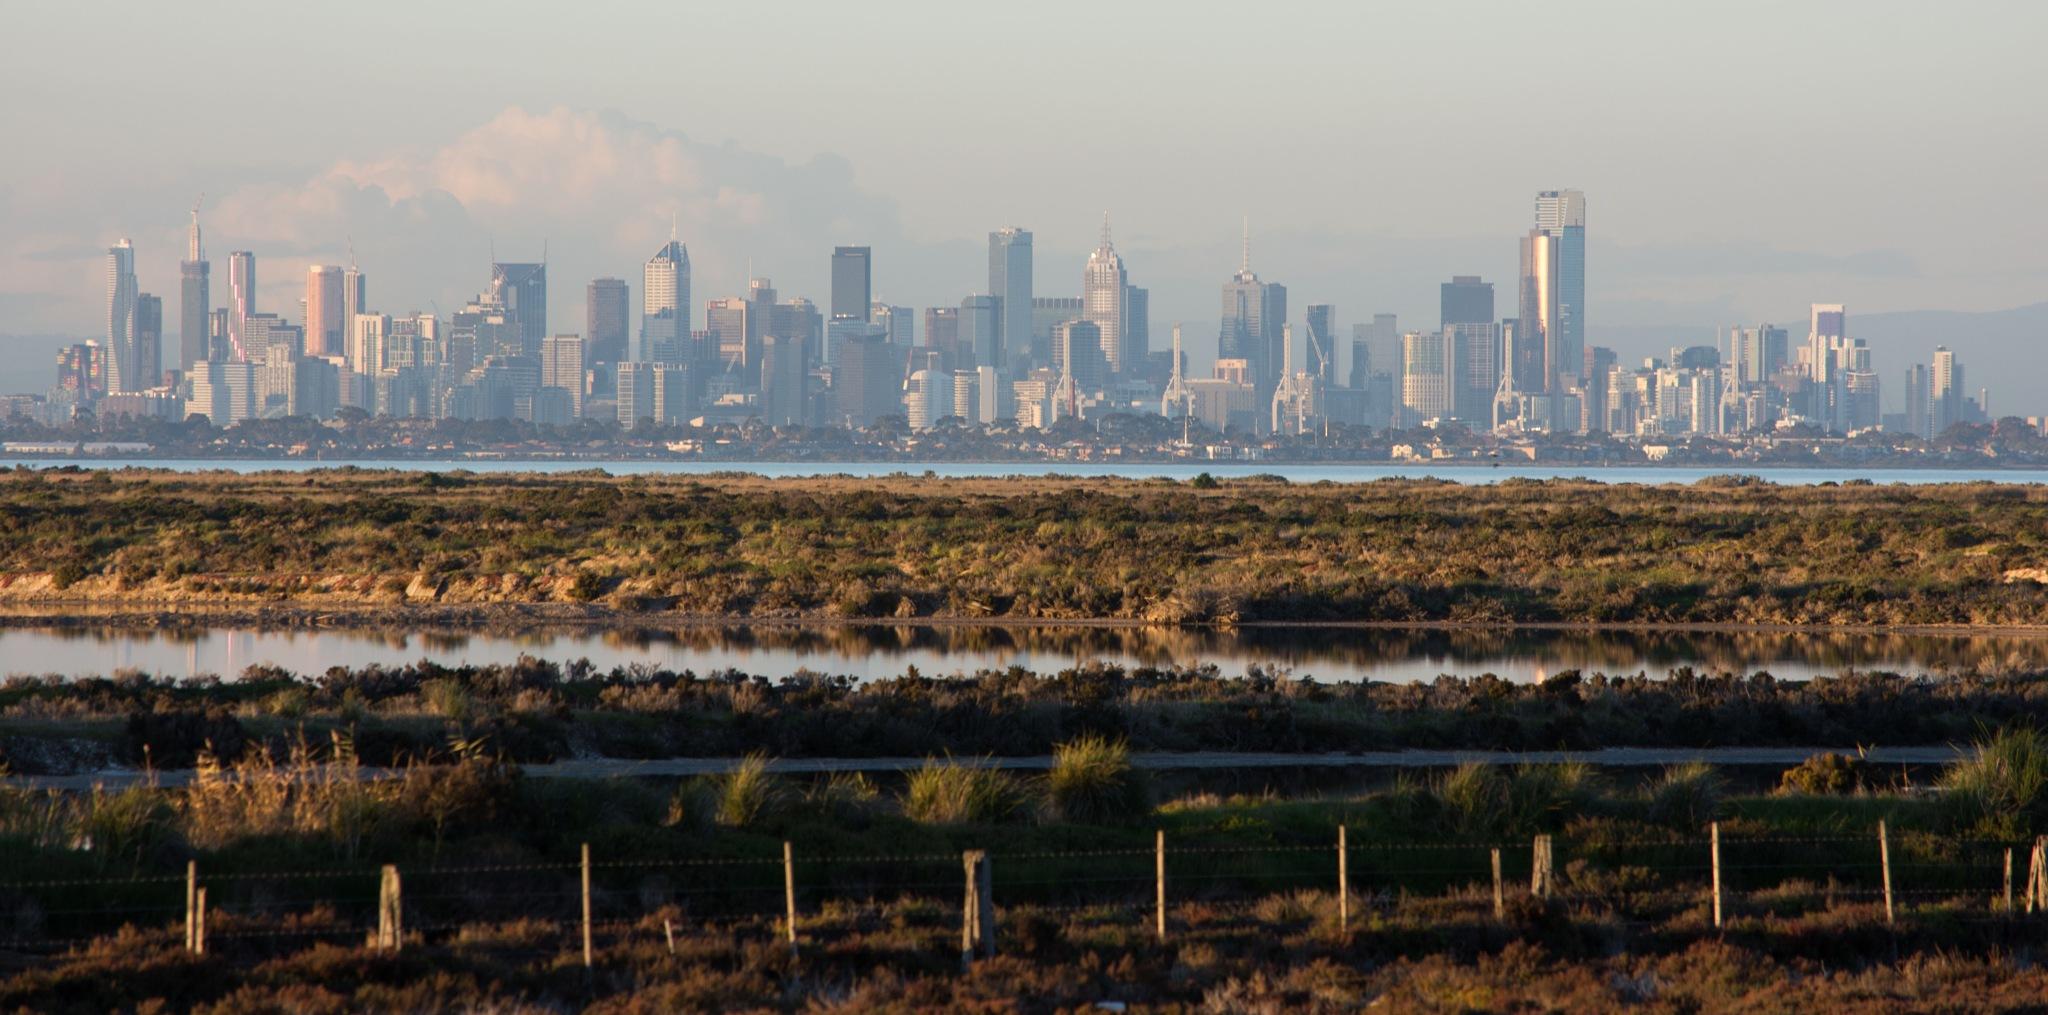 Melbourne skyline by Steve Cartwright